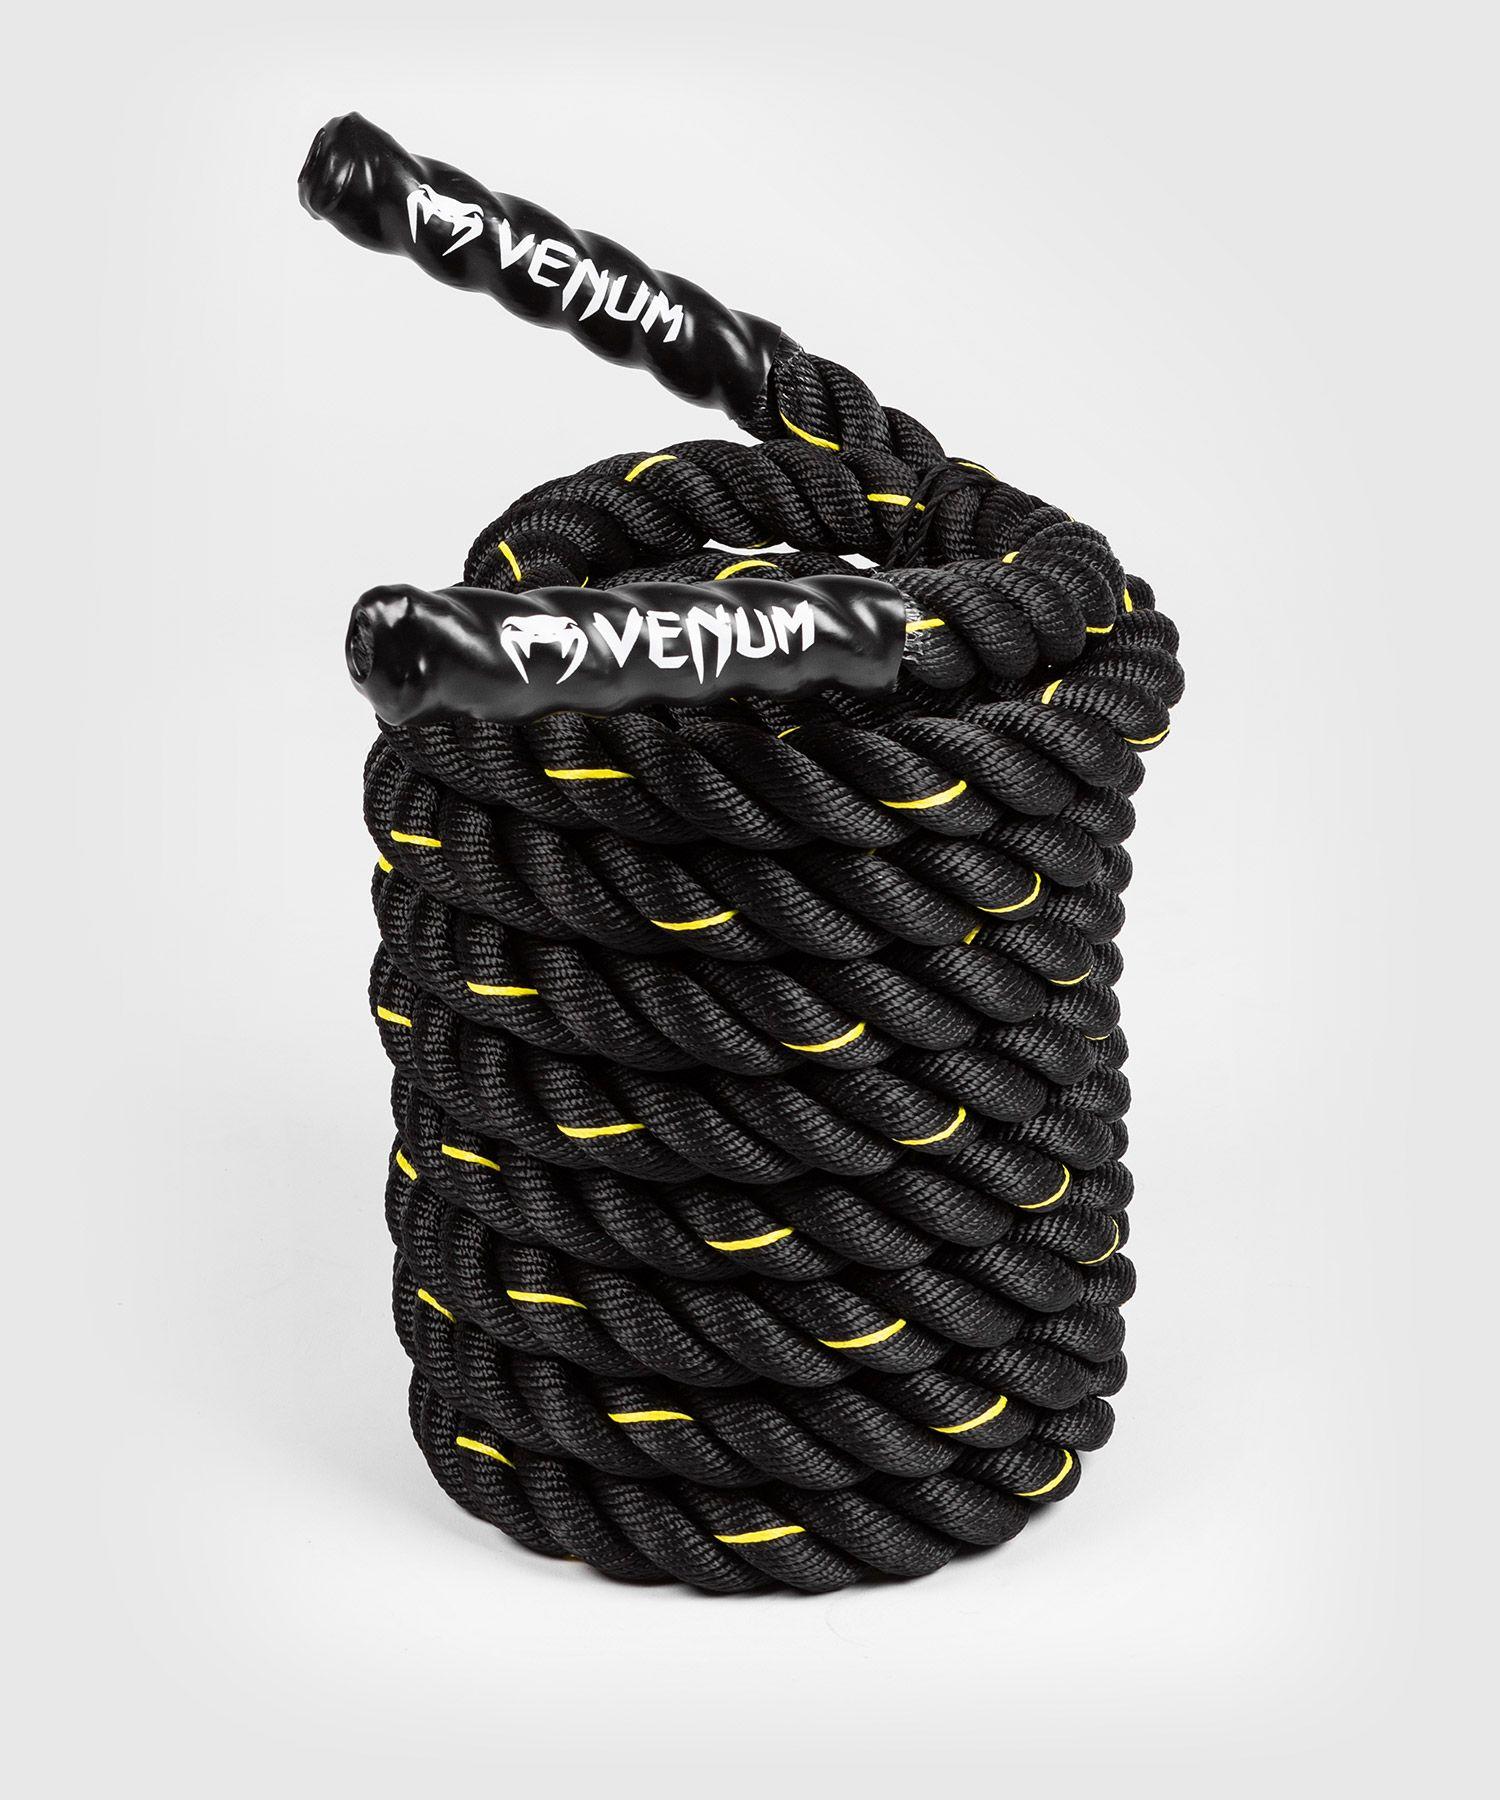 Corde da onda Challenger Venum - 9m